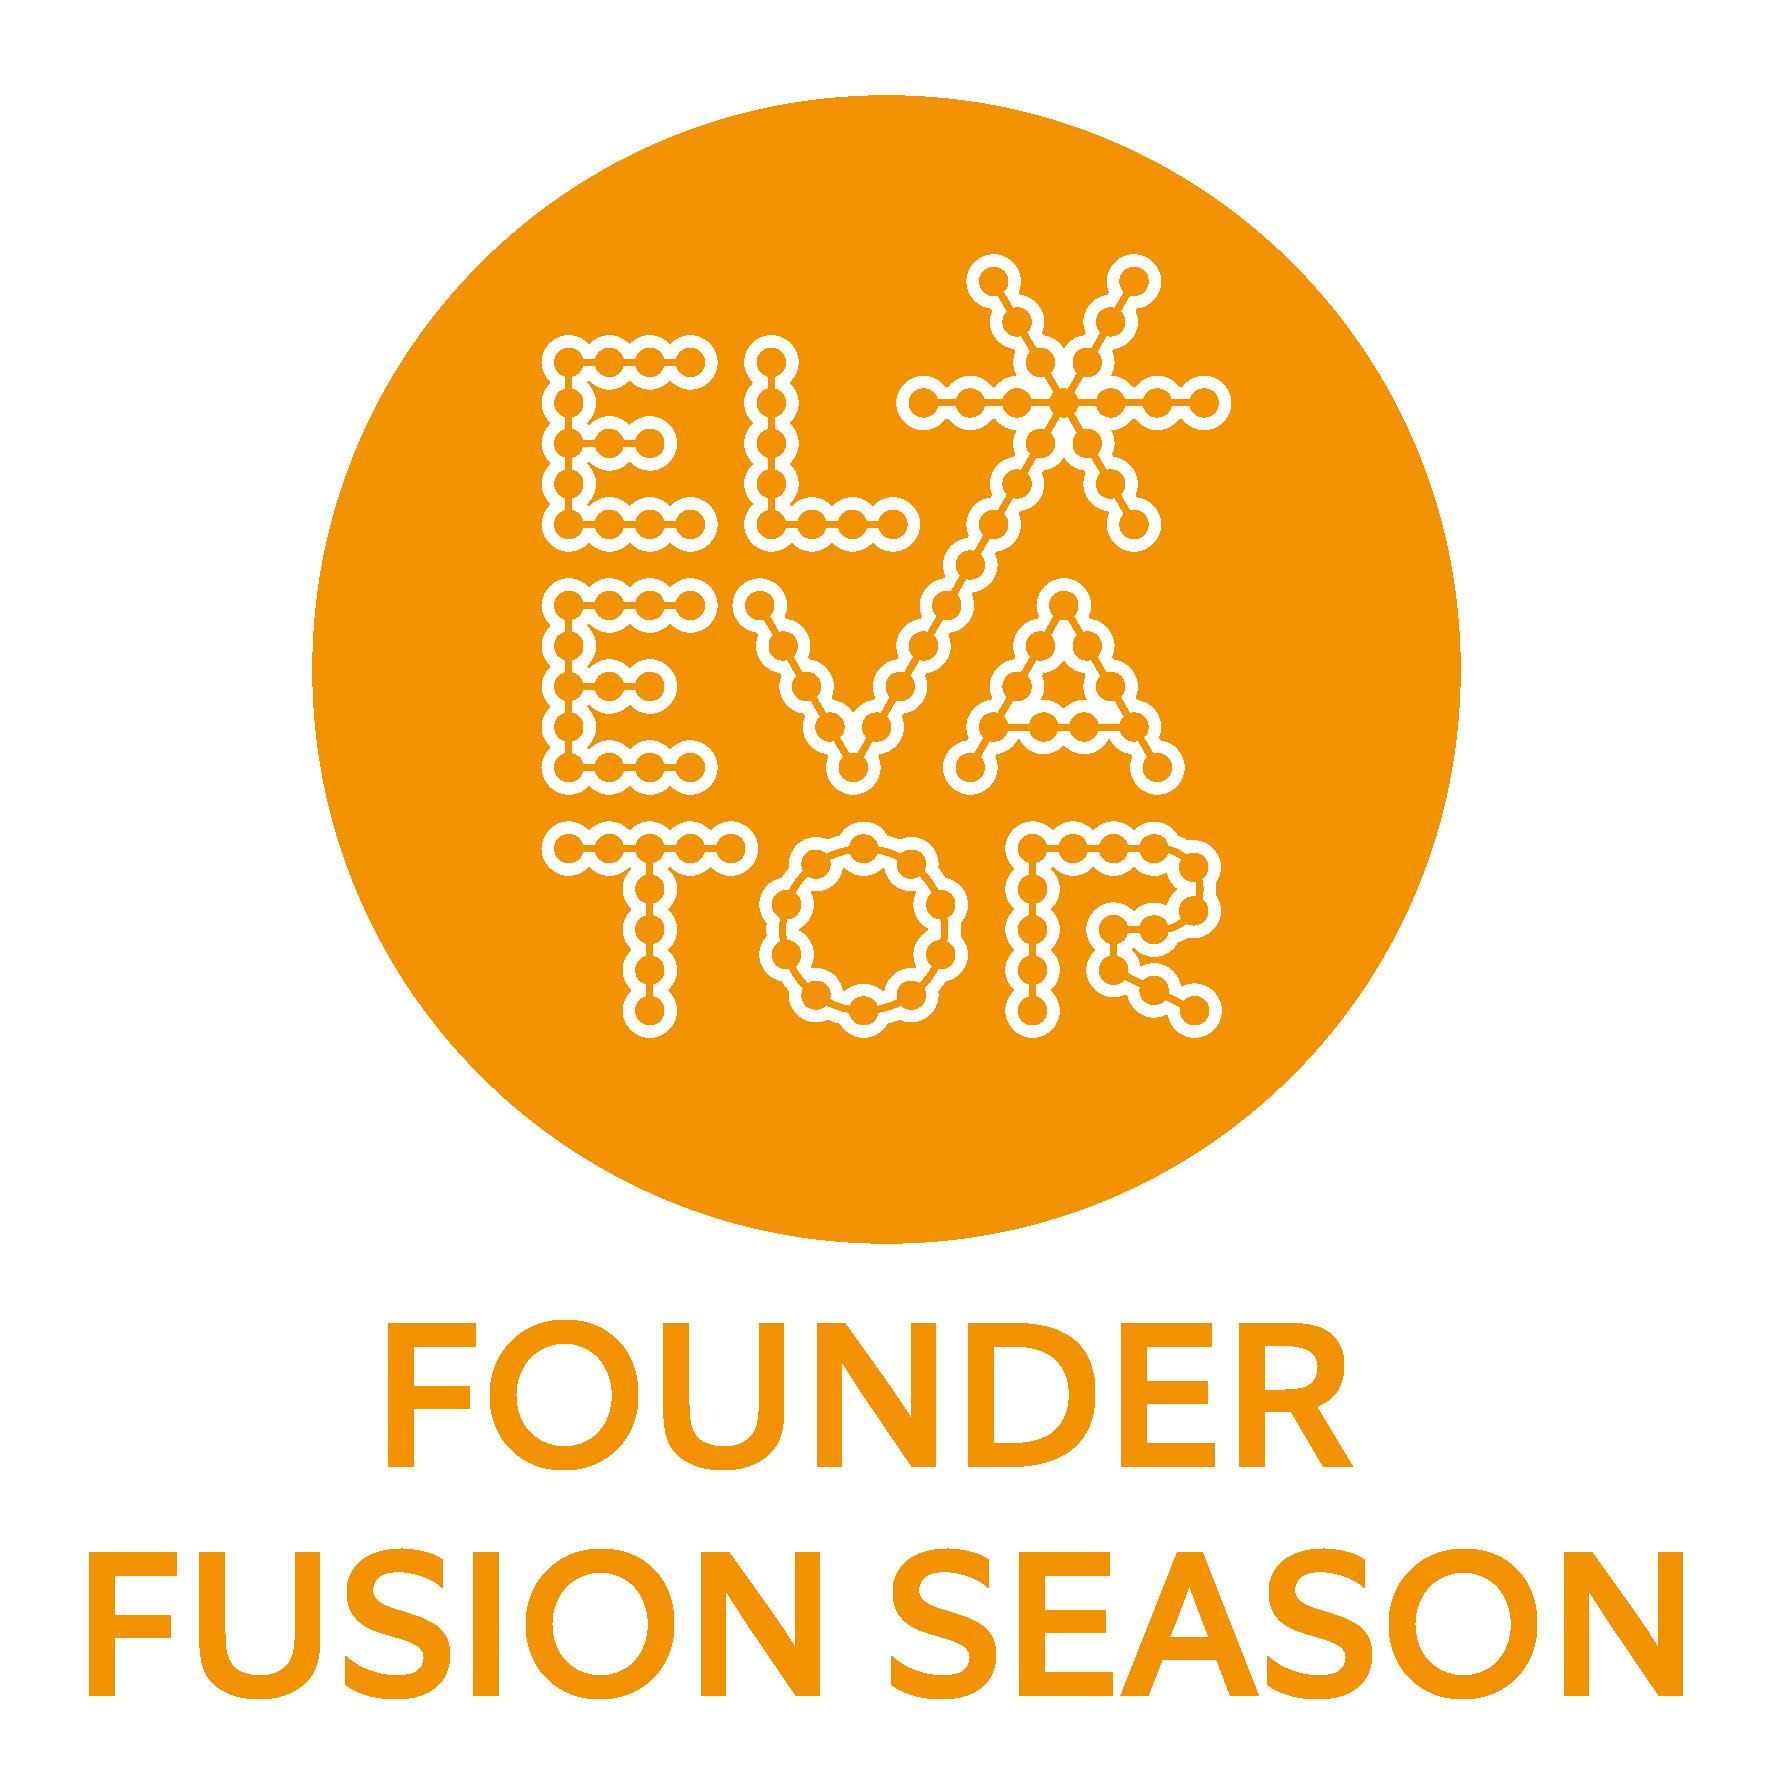 Elevator Accelerator Founder Fusion Season